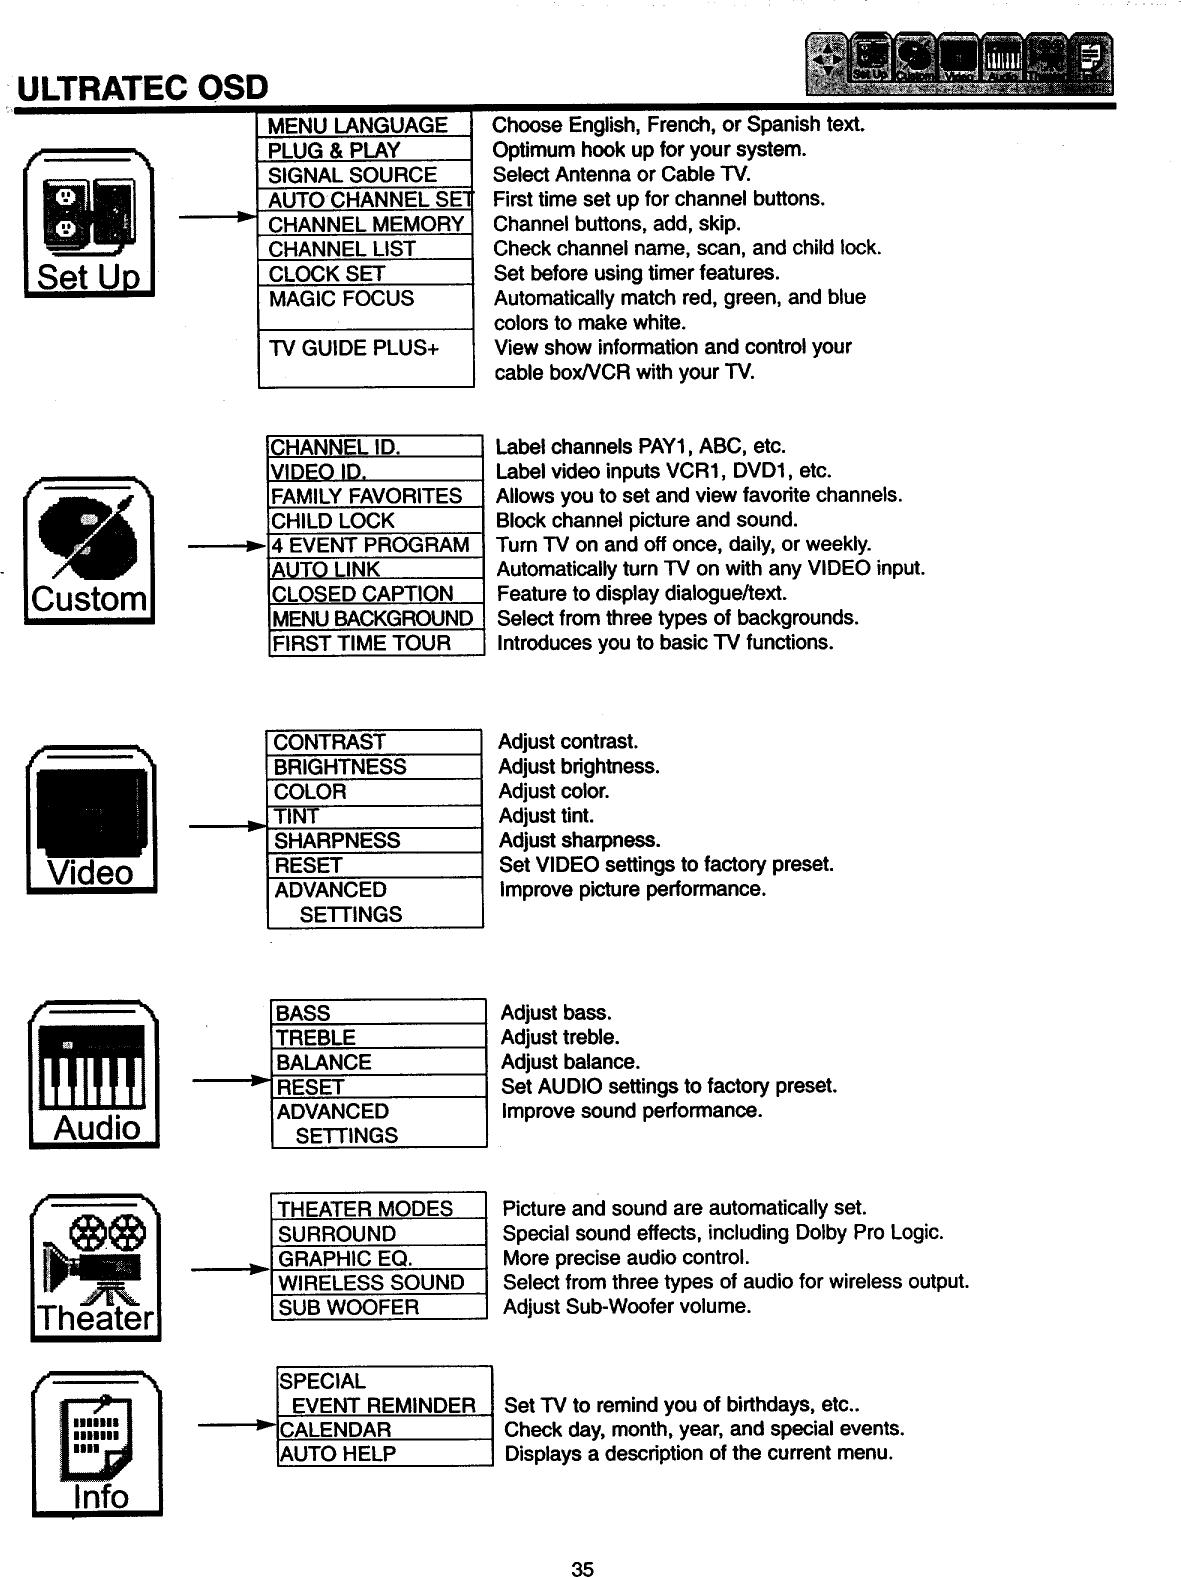 Hitachi 50SBX78B User Manual PROJECTION COLOR TV Manuals And